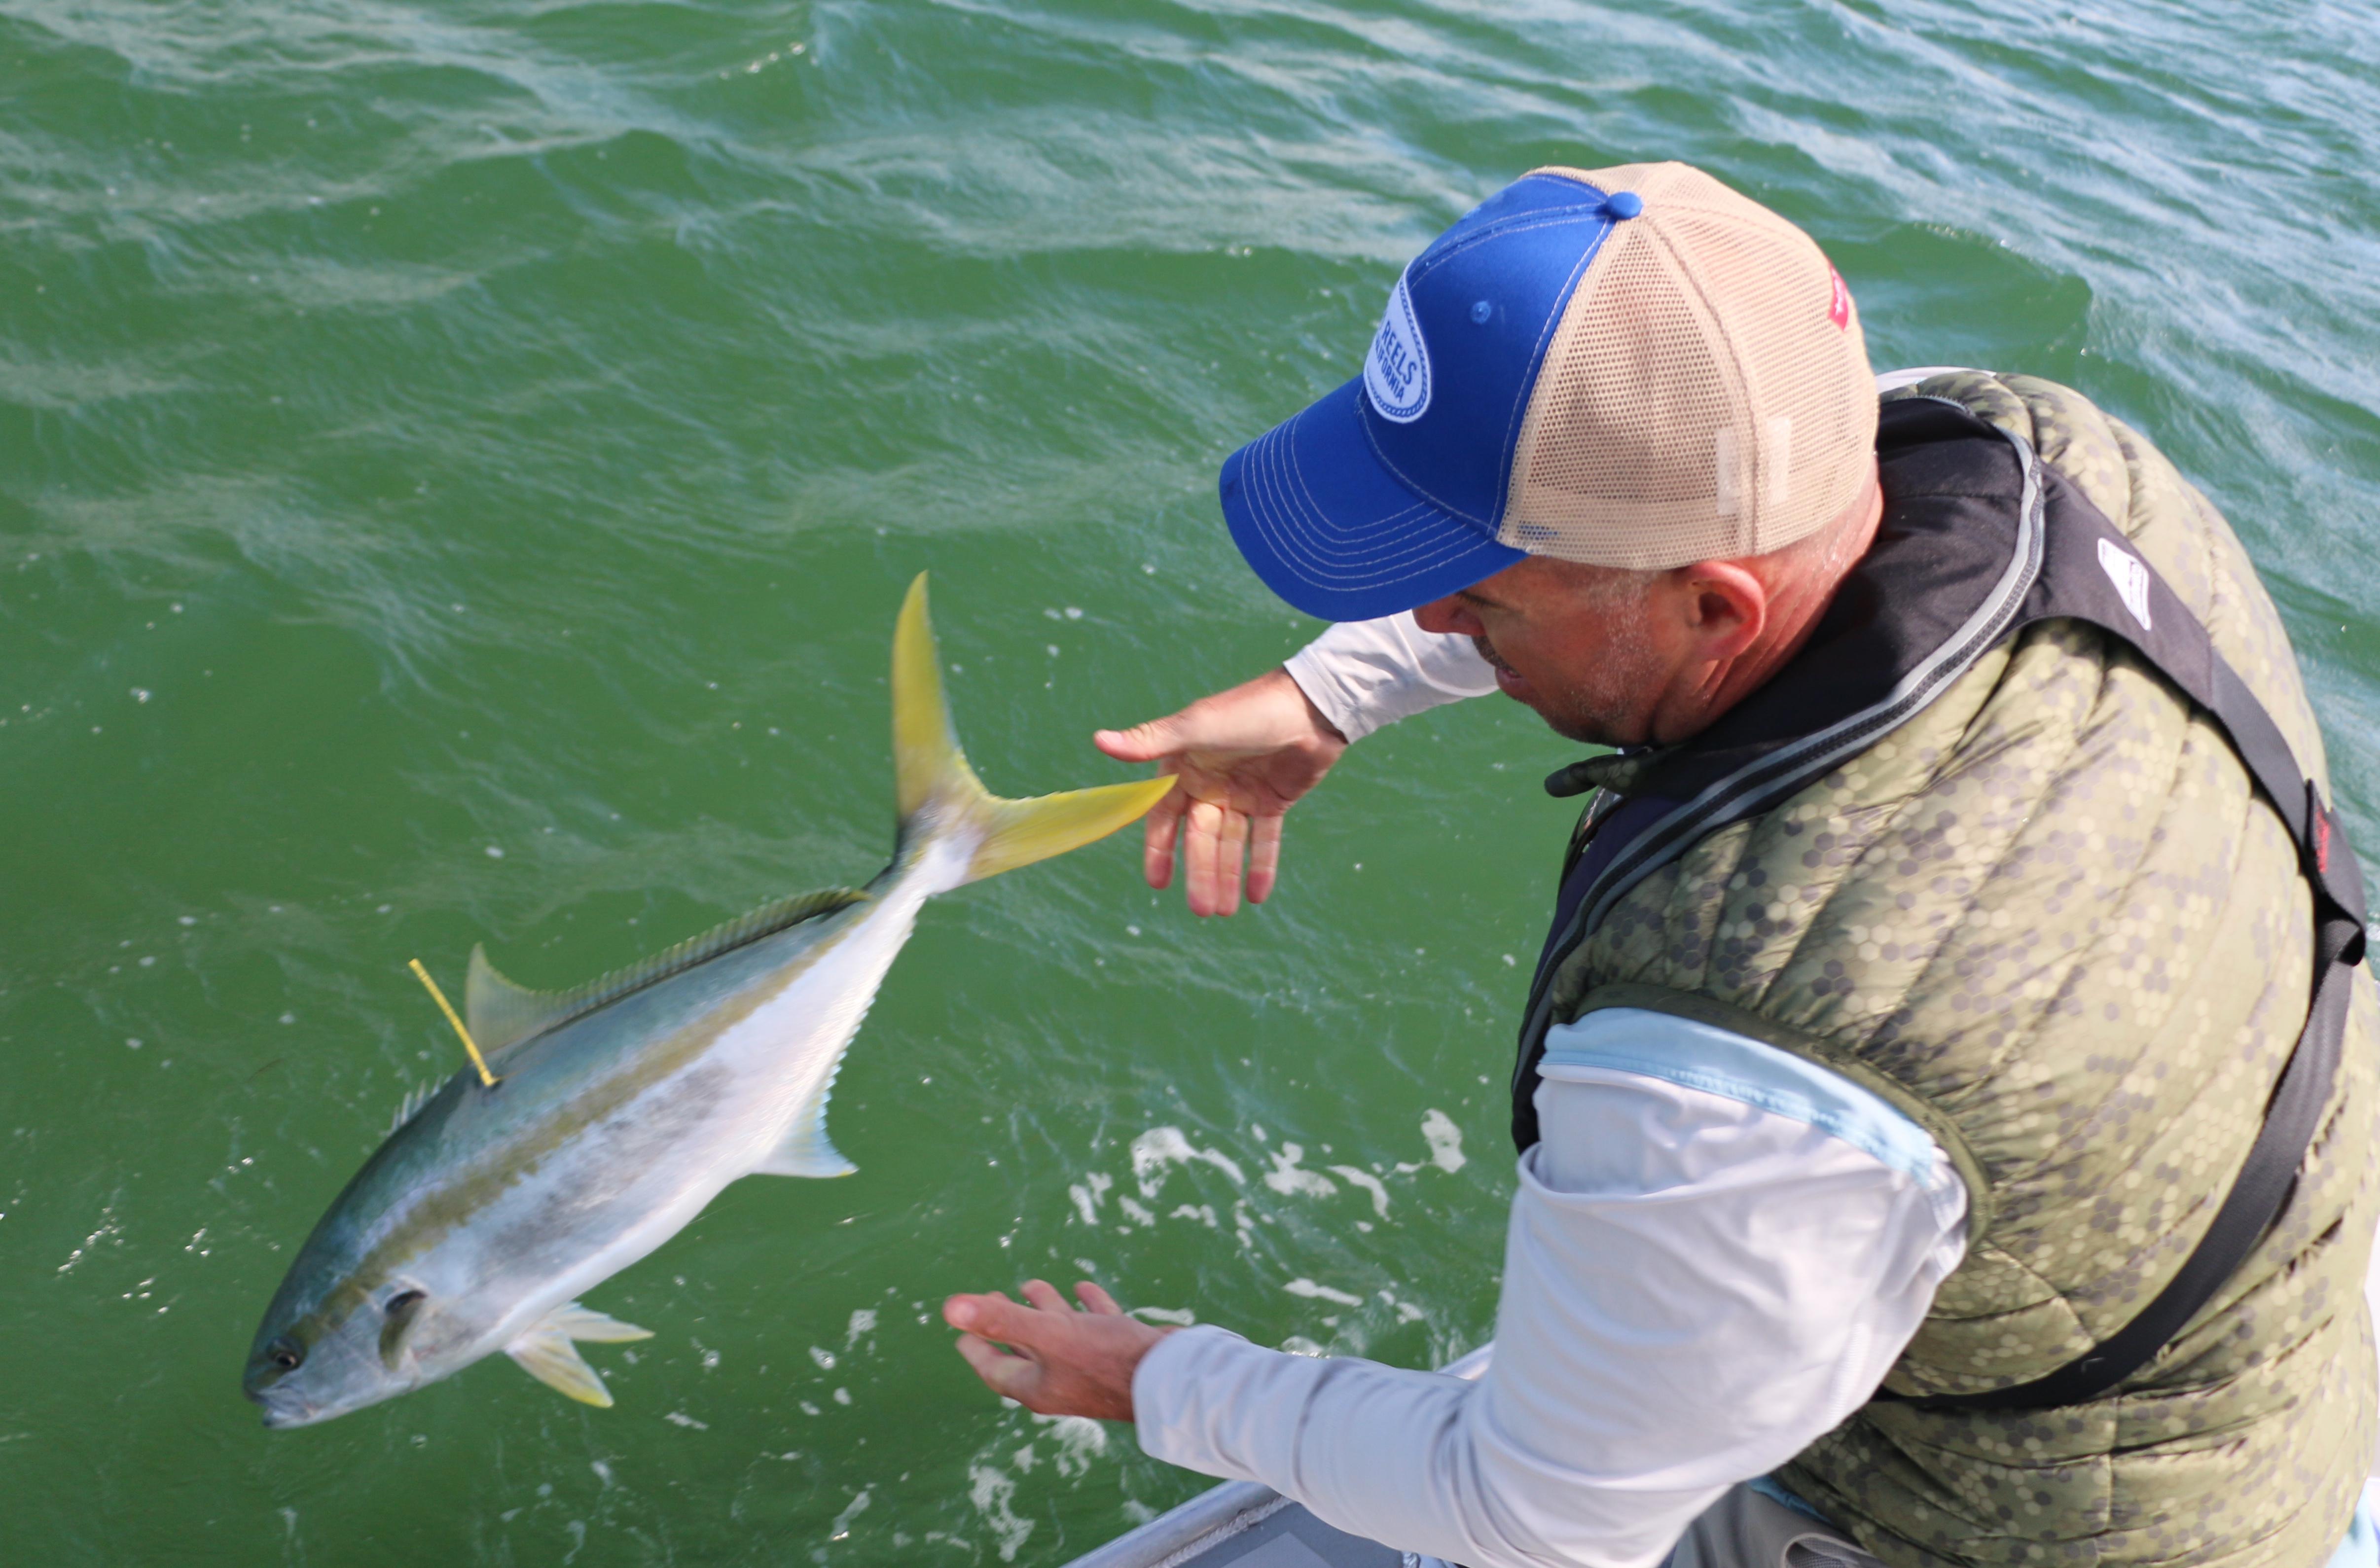 Tag, kingfish, fly rod, salt water, collingwood, manukau, waiheke island